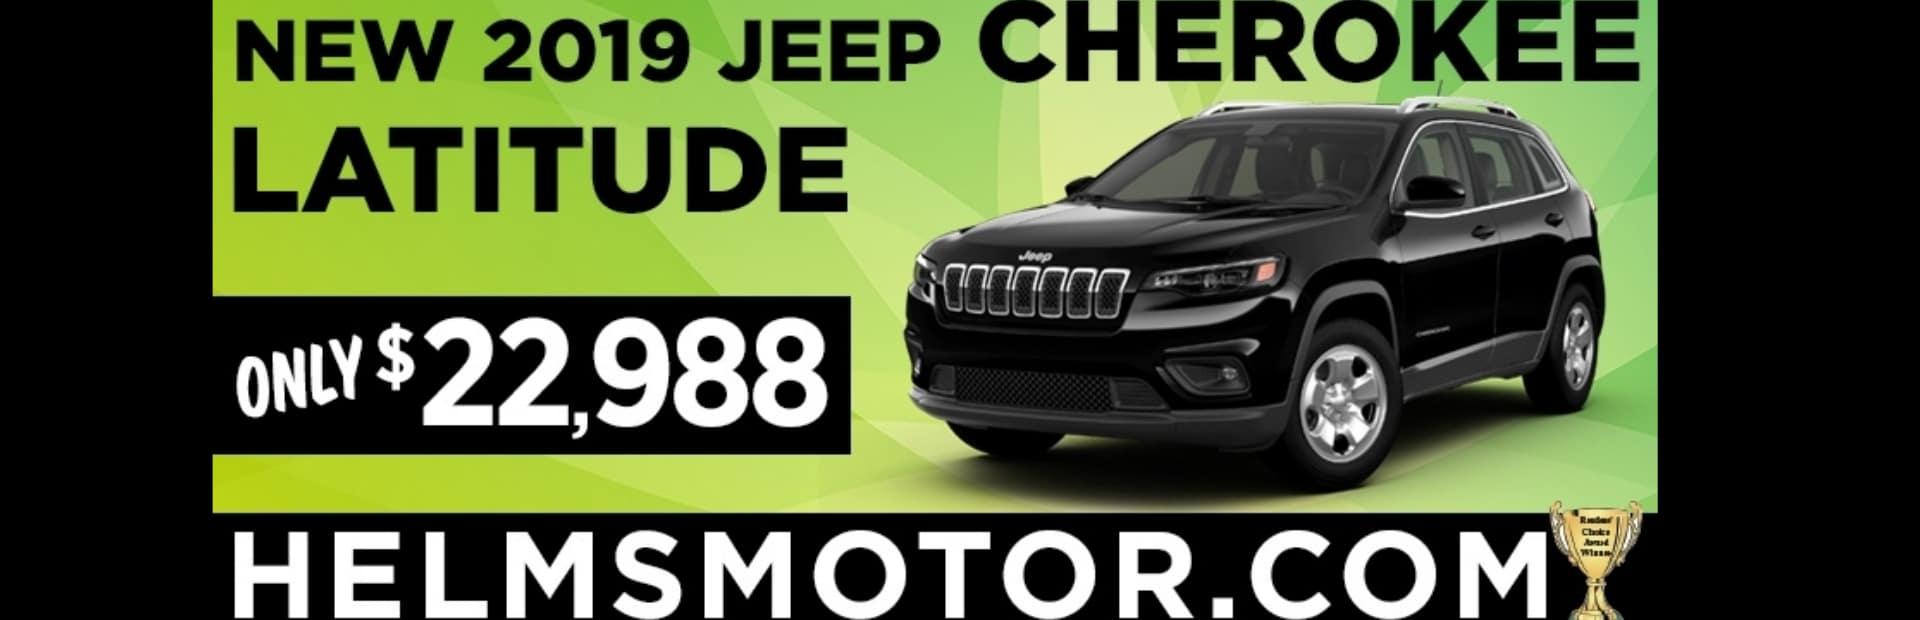 Helms Motor Co Chrysler Dodge Jeep Ram Dealer In Lexington Tn